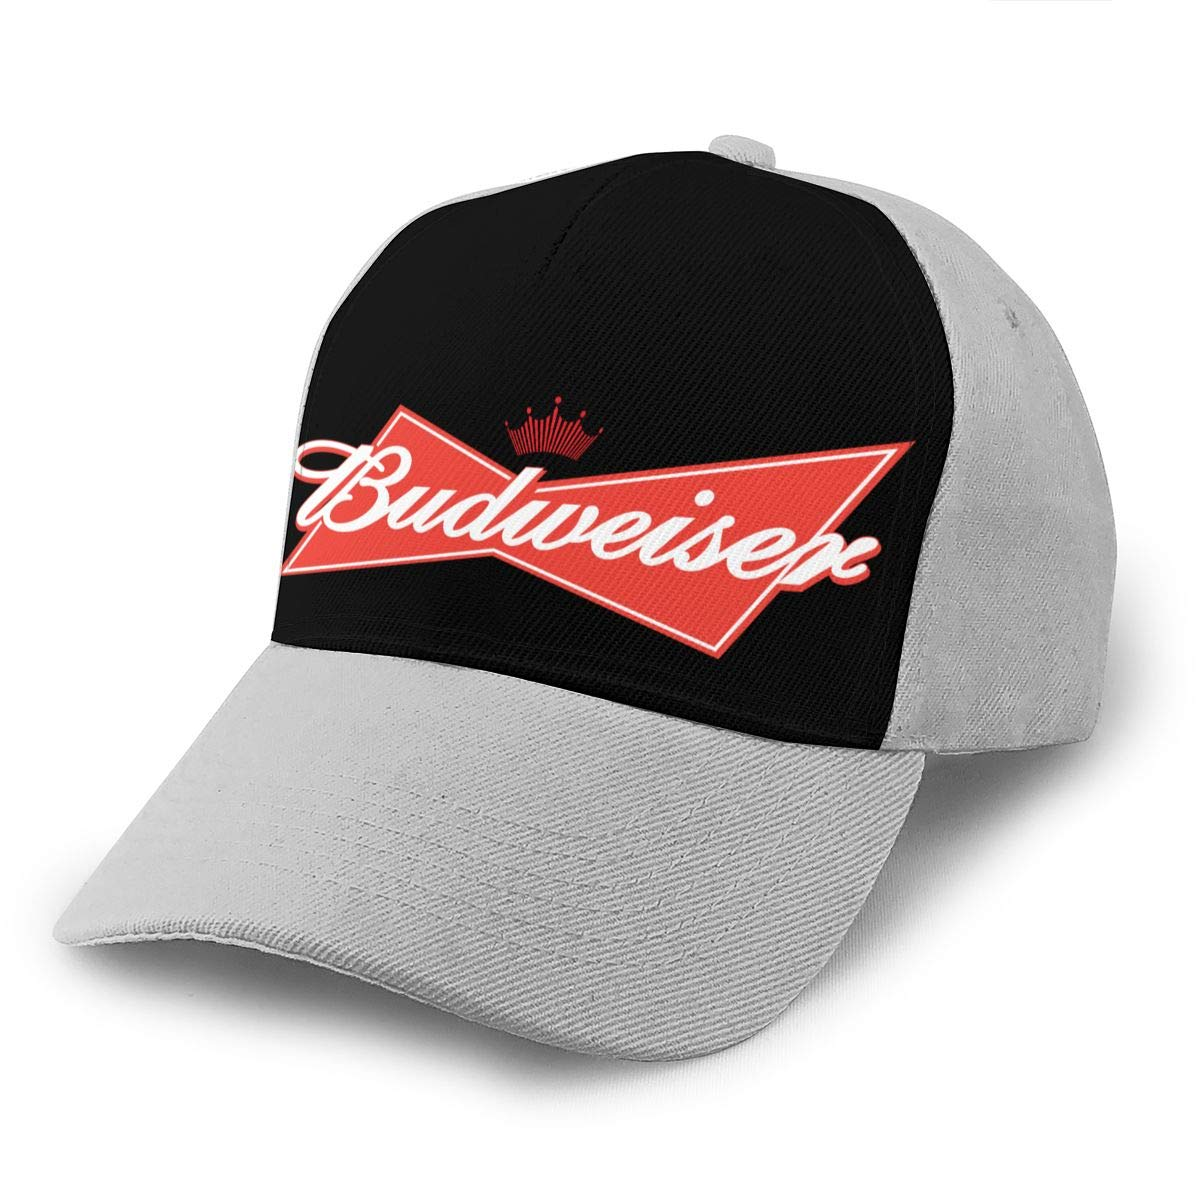 Adjustable Women Men Budweiser-Logo Print Baseball Cap Flat Brim Cap Hats Hip Hop Snapback Sun Hat Boys Girls Gray by Apolonia